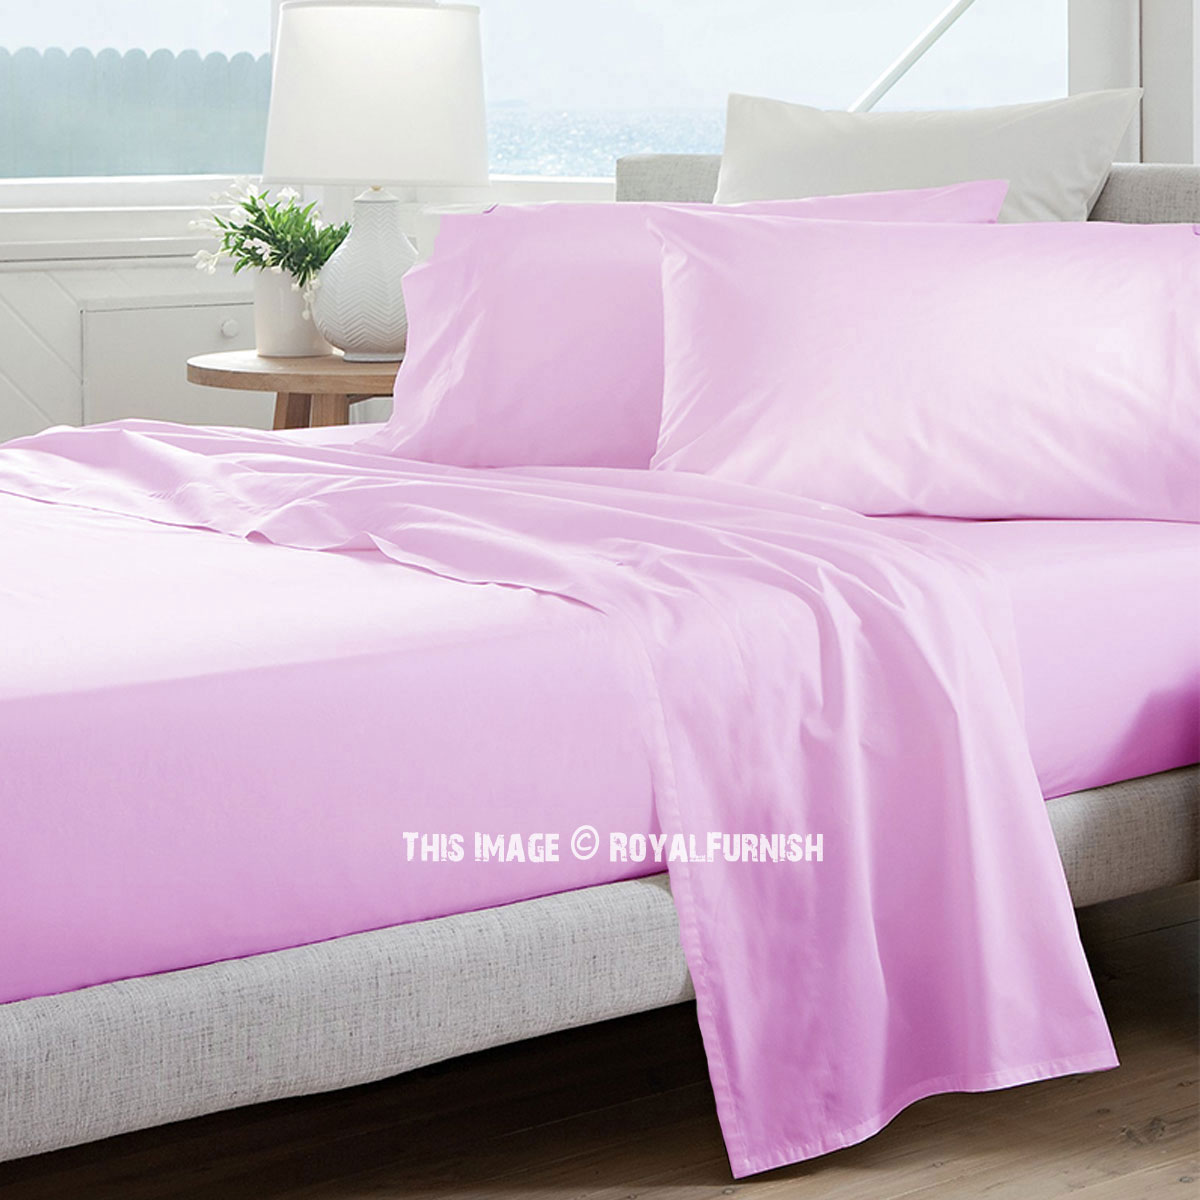 Hypoallergenic 4pc Cotton Bed Sheet Set